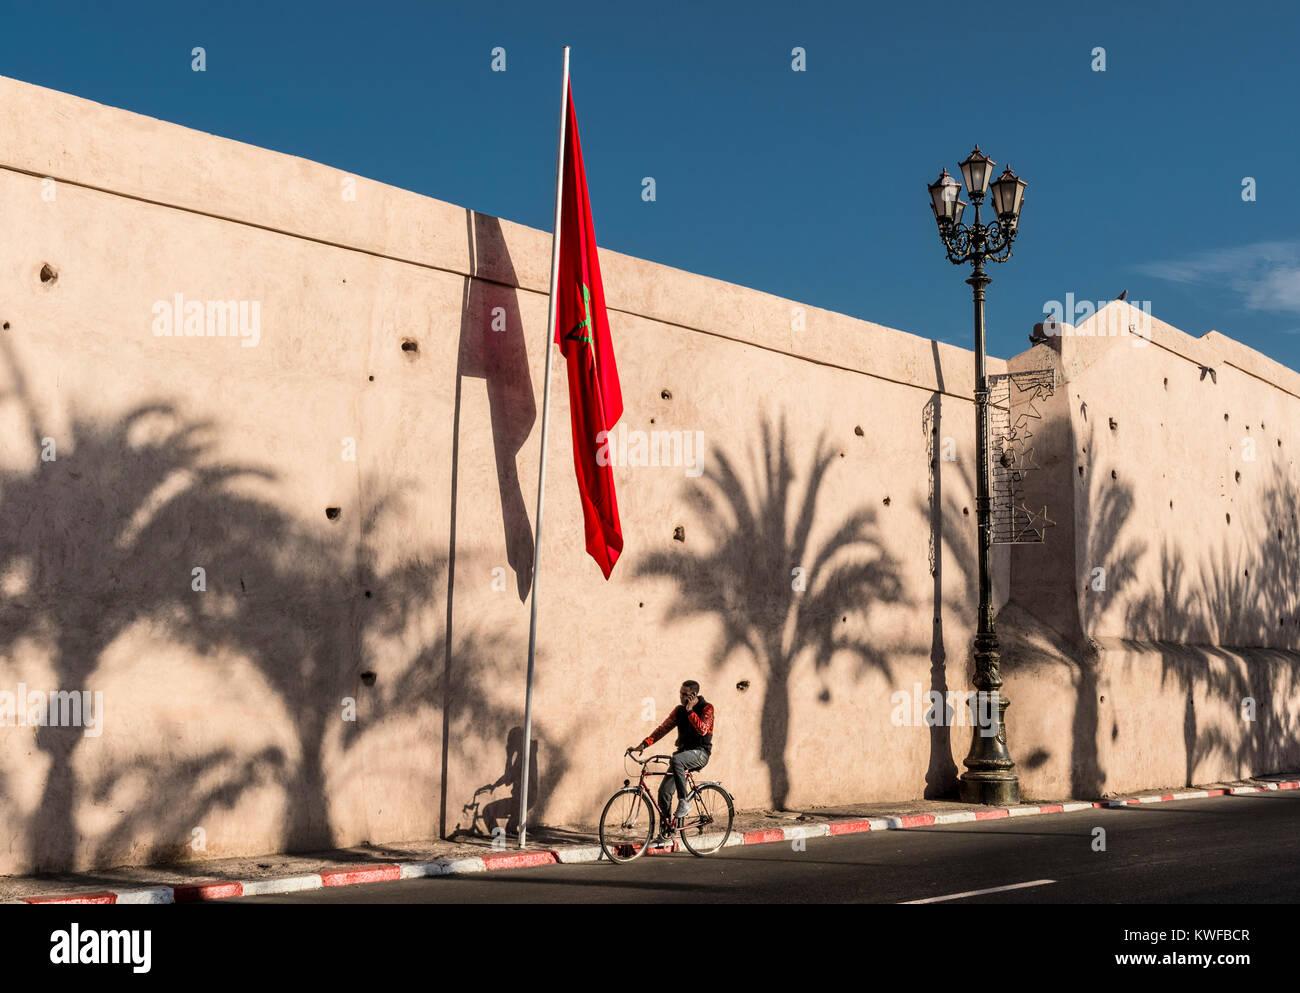 Moroccan Flag and Medina city walls with palm shadows. - Stock Image